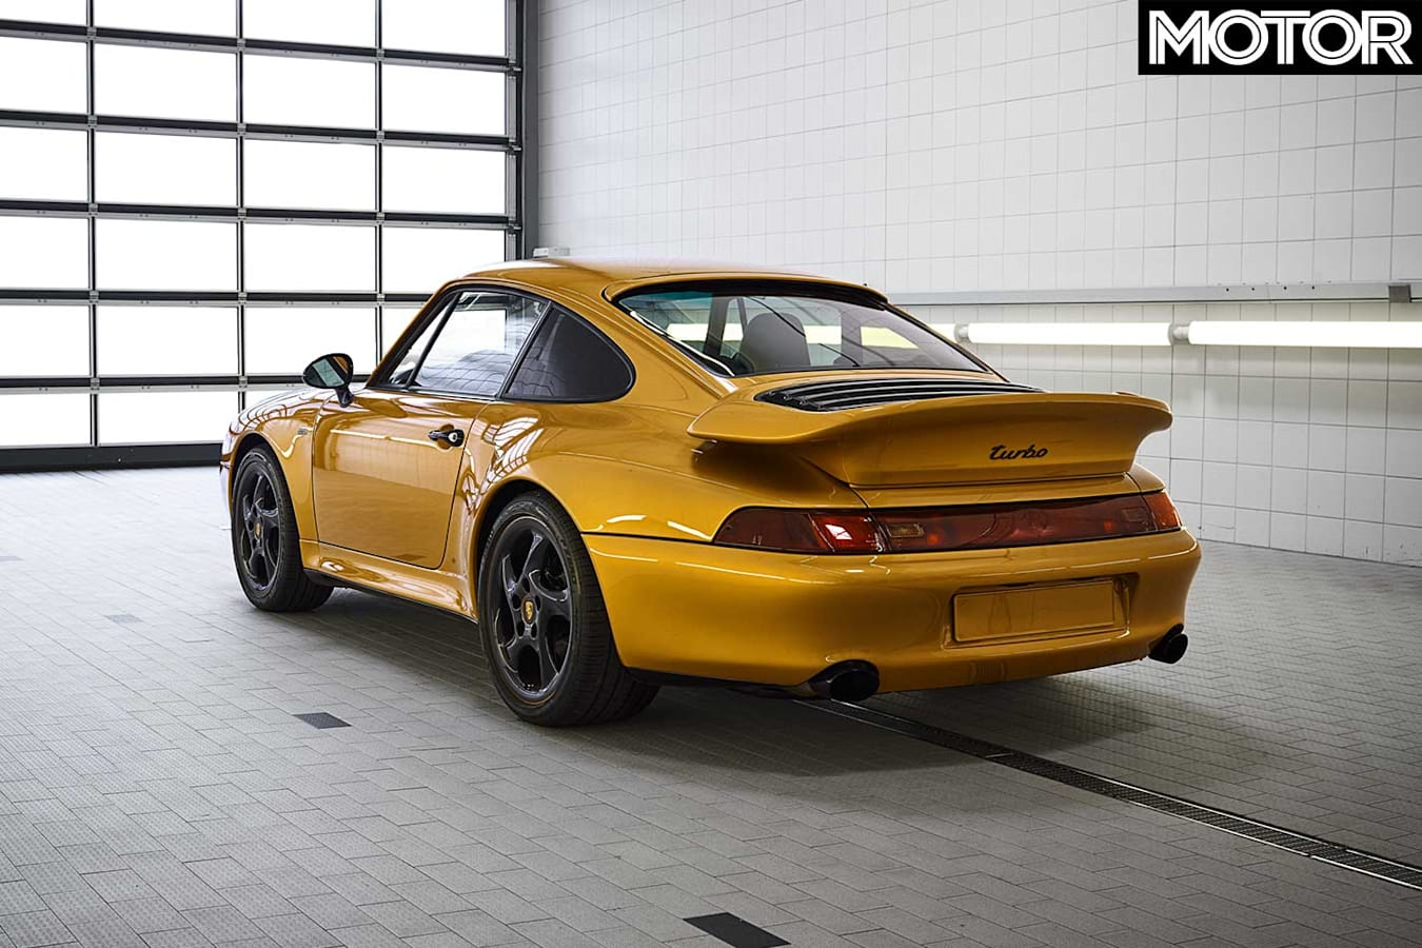 Rebuilt Porsche 993 911 Turbo Rear Jpg